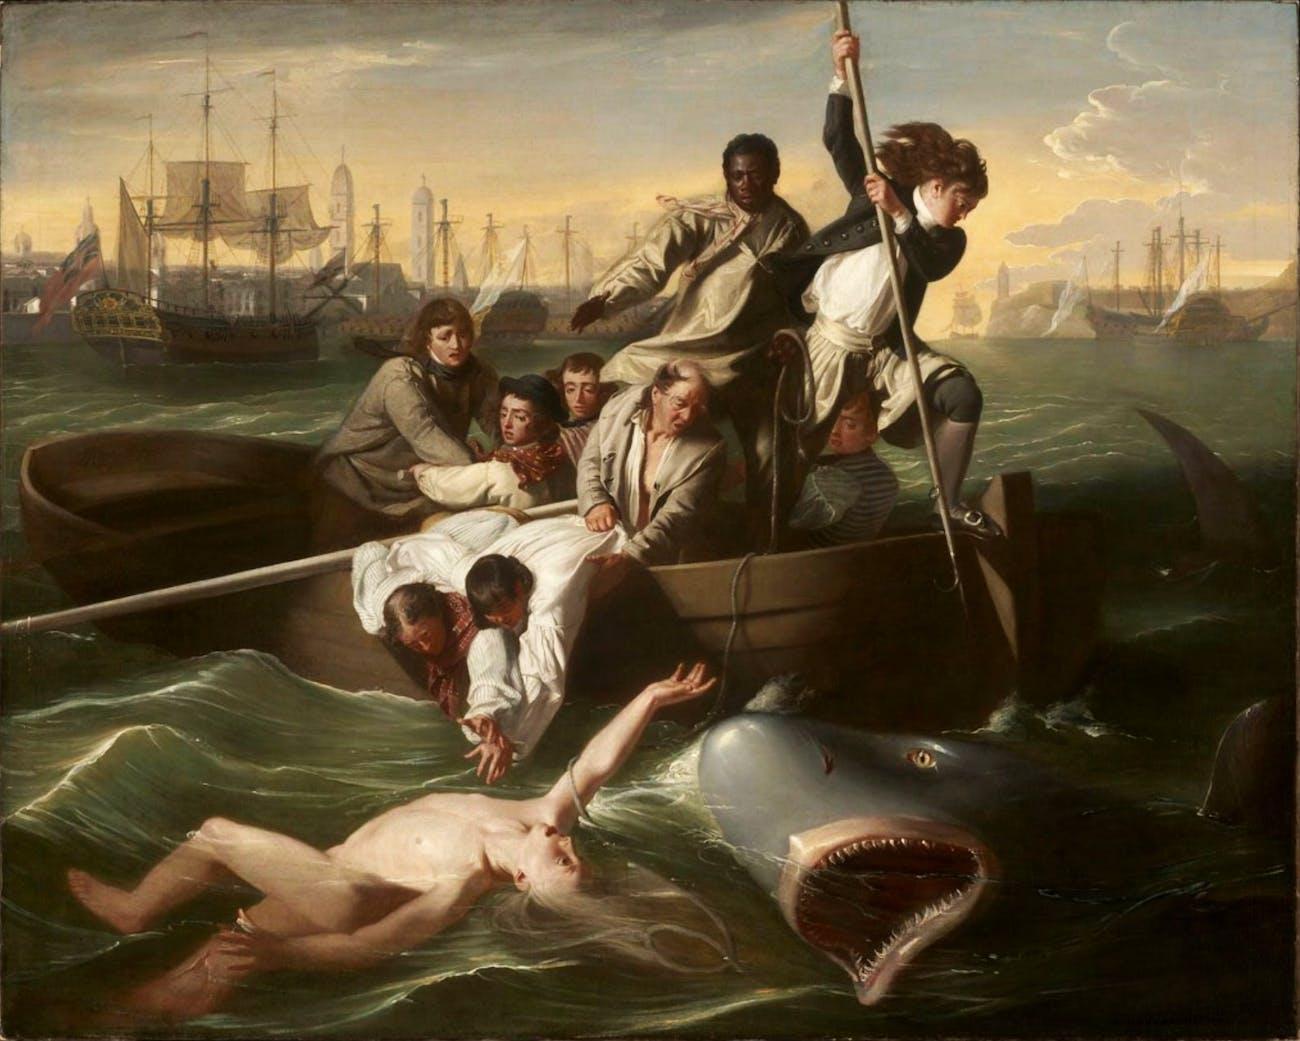 John Singleton Copley Watson and the Shark